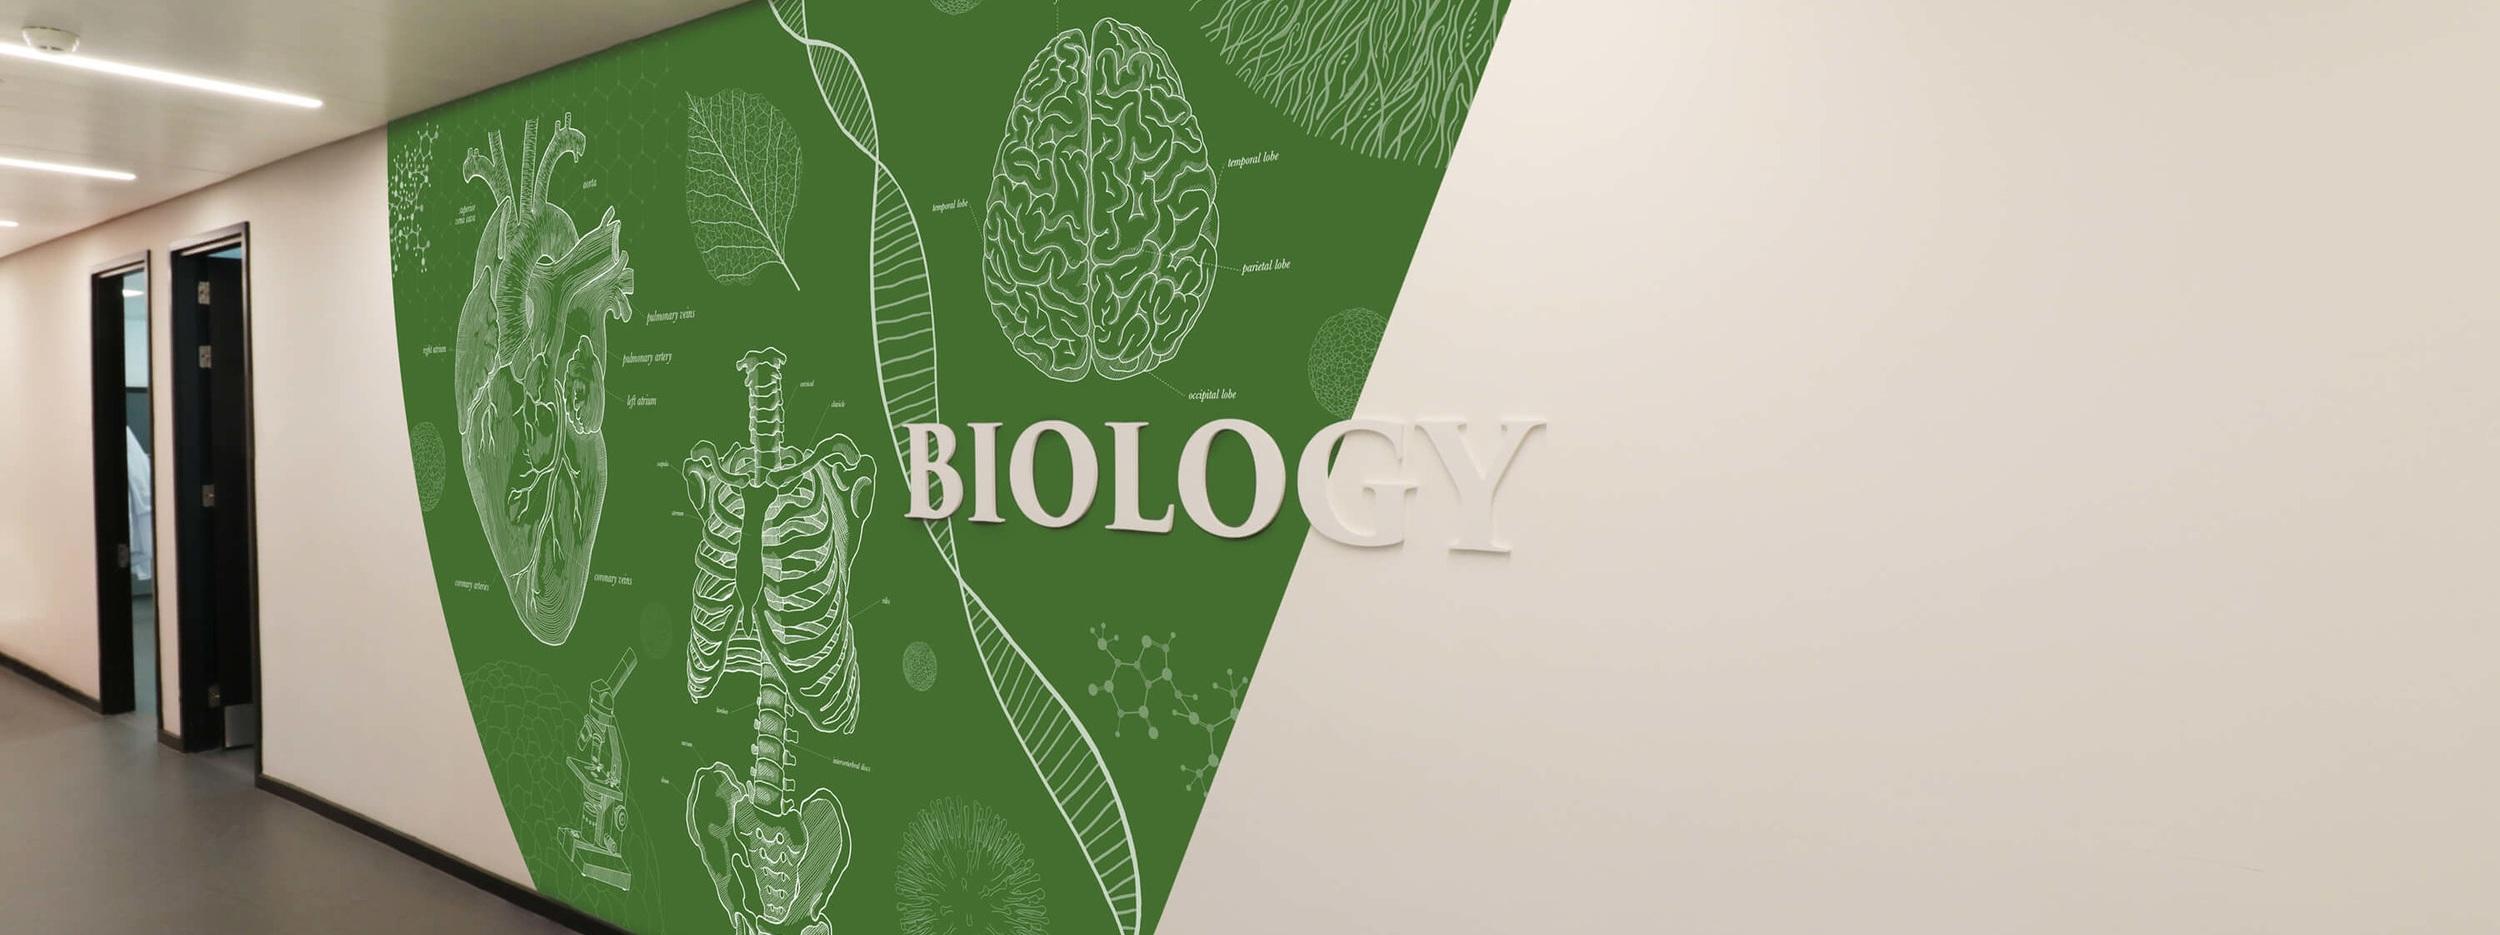 dld_college_london_blueprint_wonderwall_biology_banner.jpg